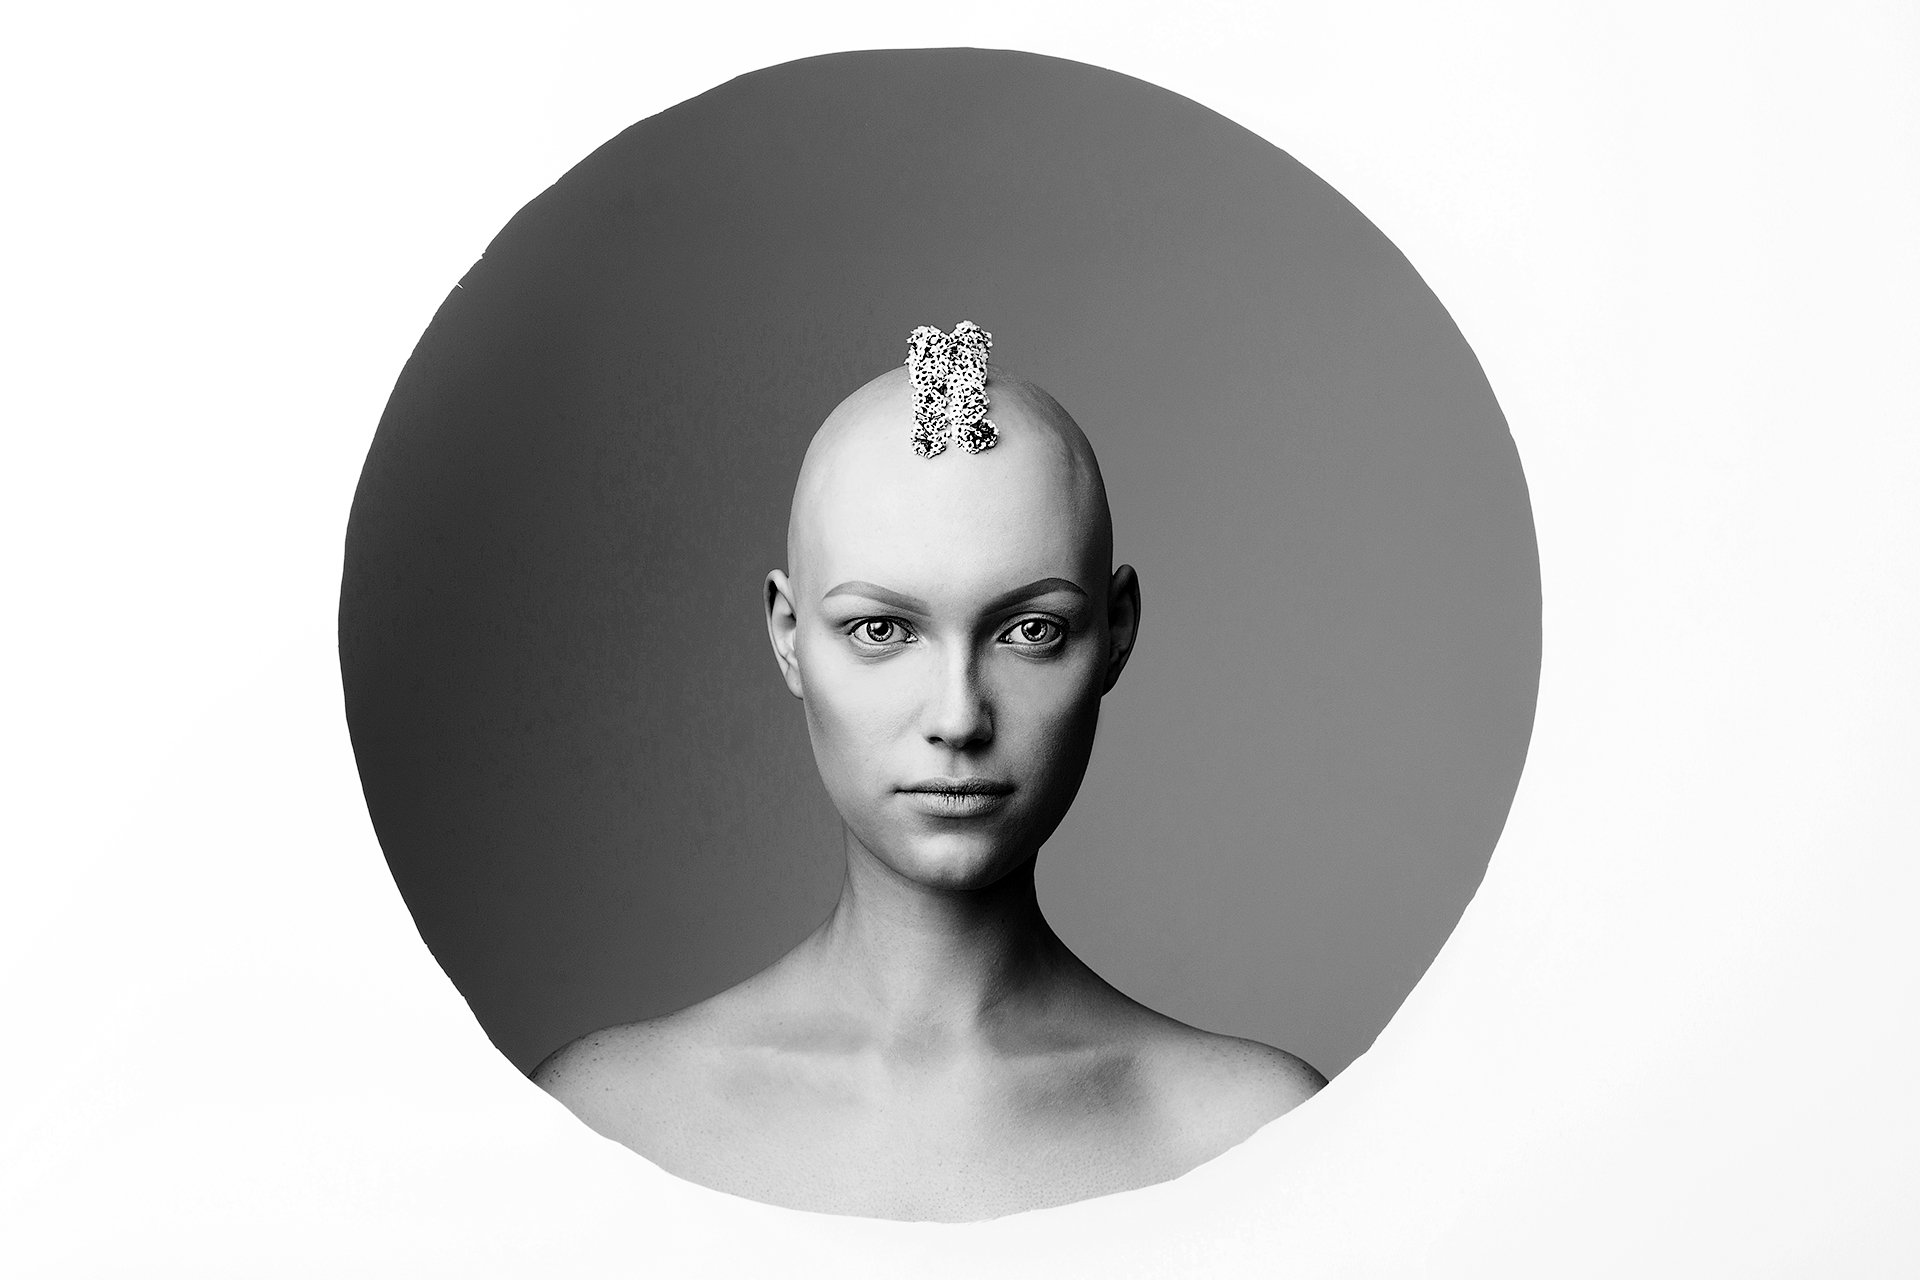 девушка, фон, фигура, геометрия, круг, цветы, чб, концептуальная, арт, инопланетная, Комарова Дарья